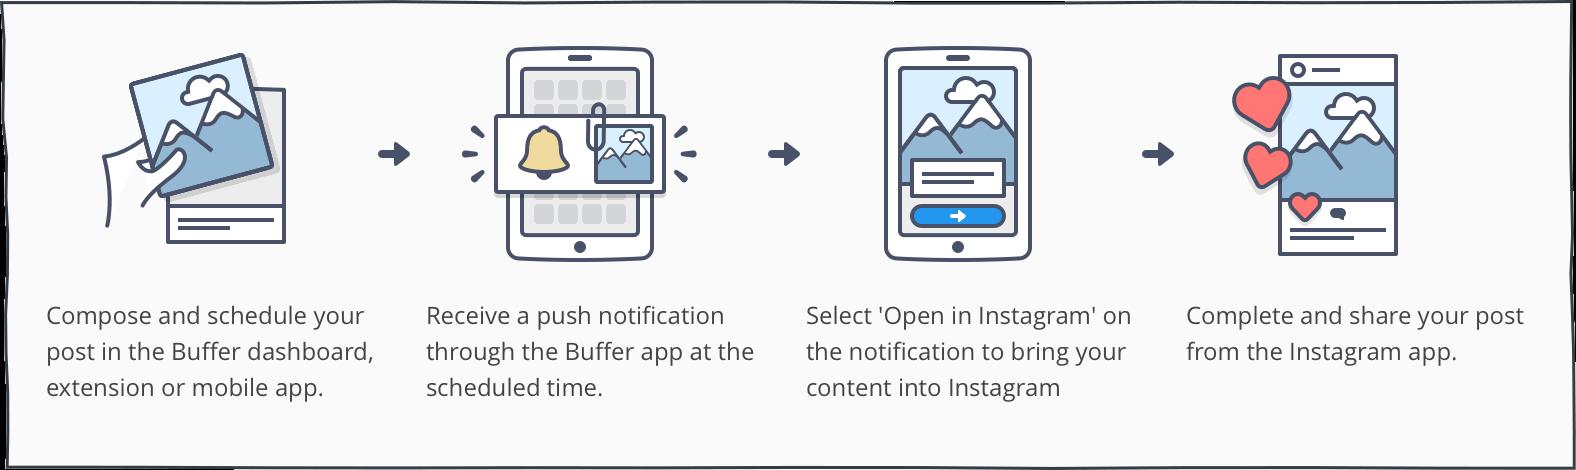 IG-Buffer-instructions